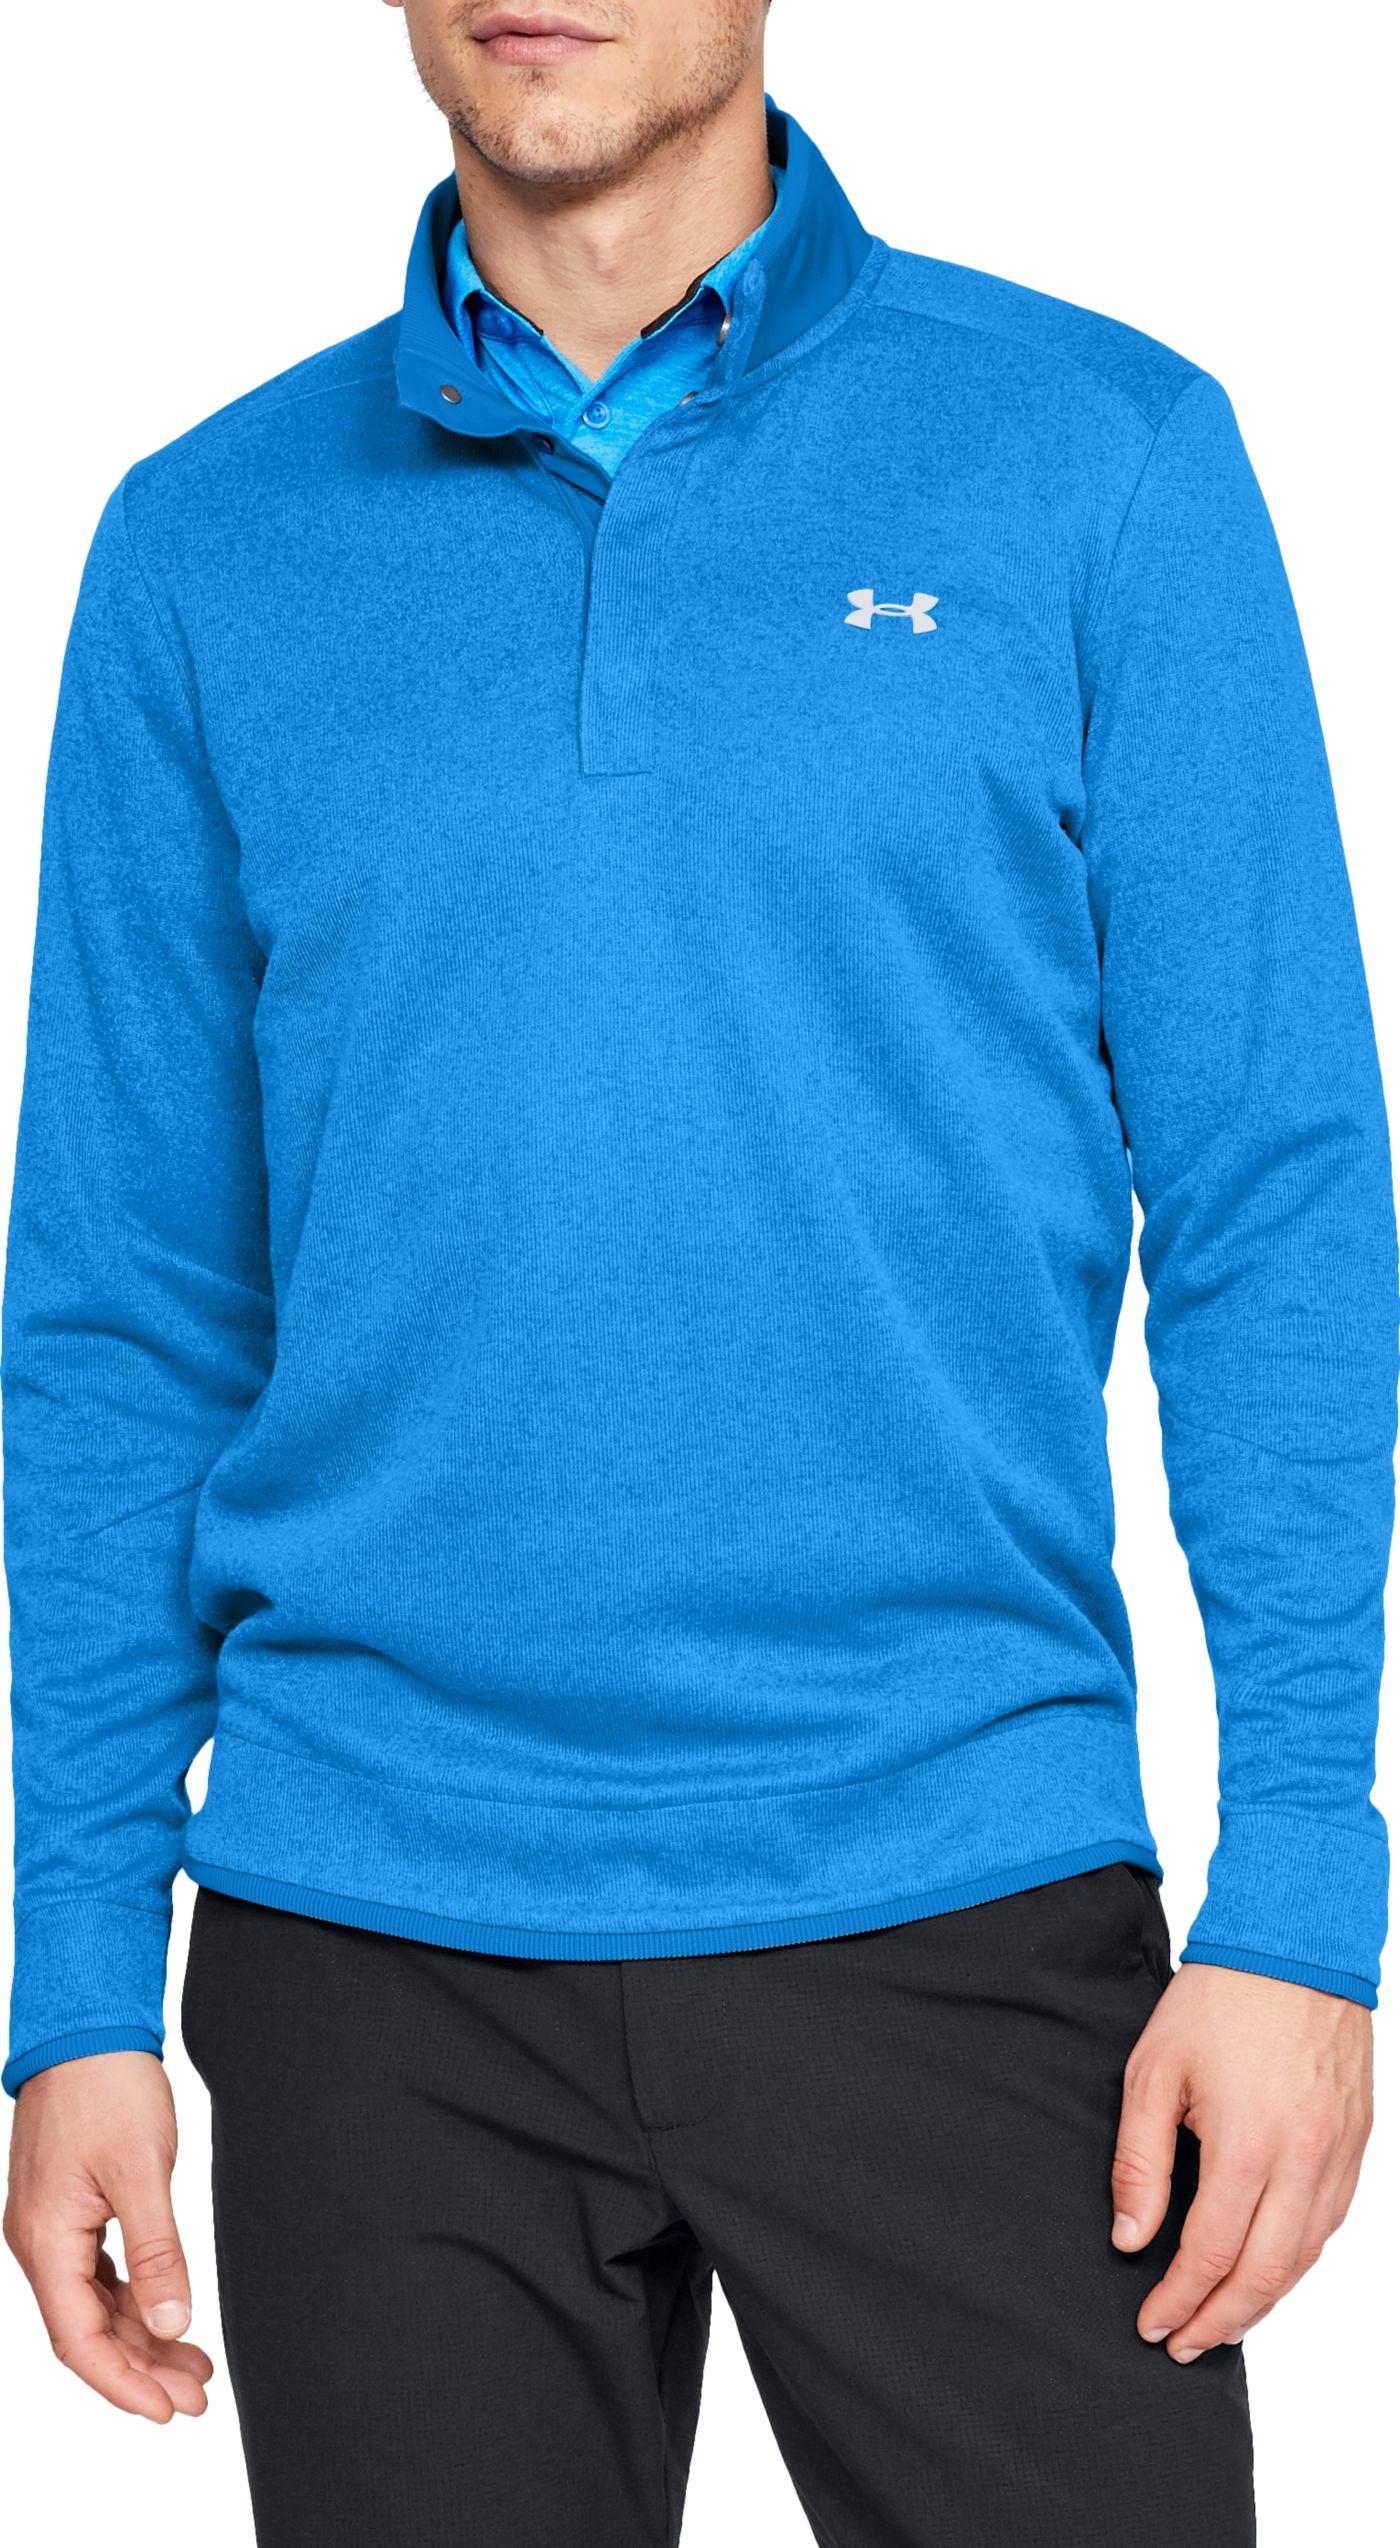 Under Armour Men's SweaterFleece Snap Mock Golf Pullover